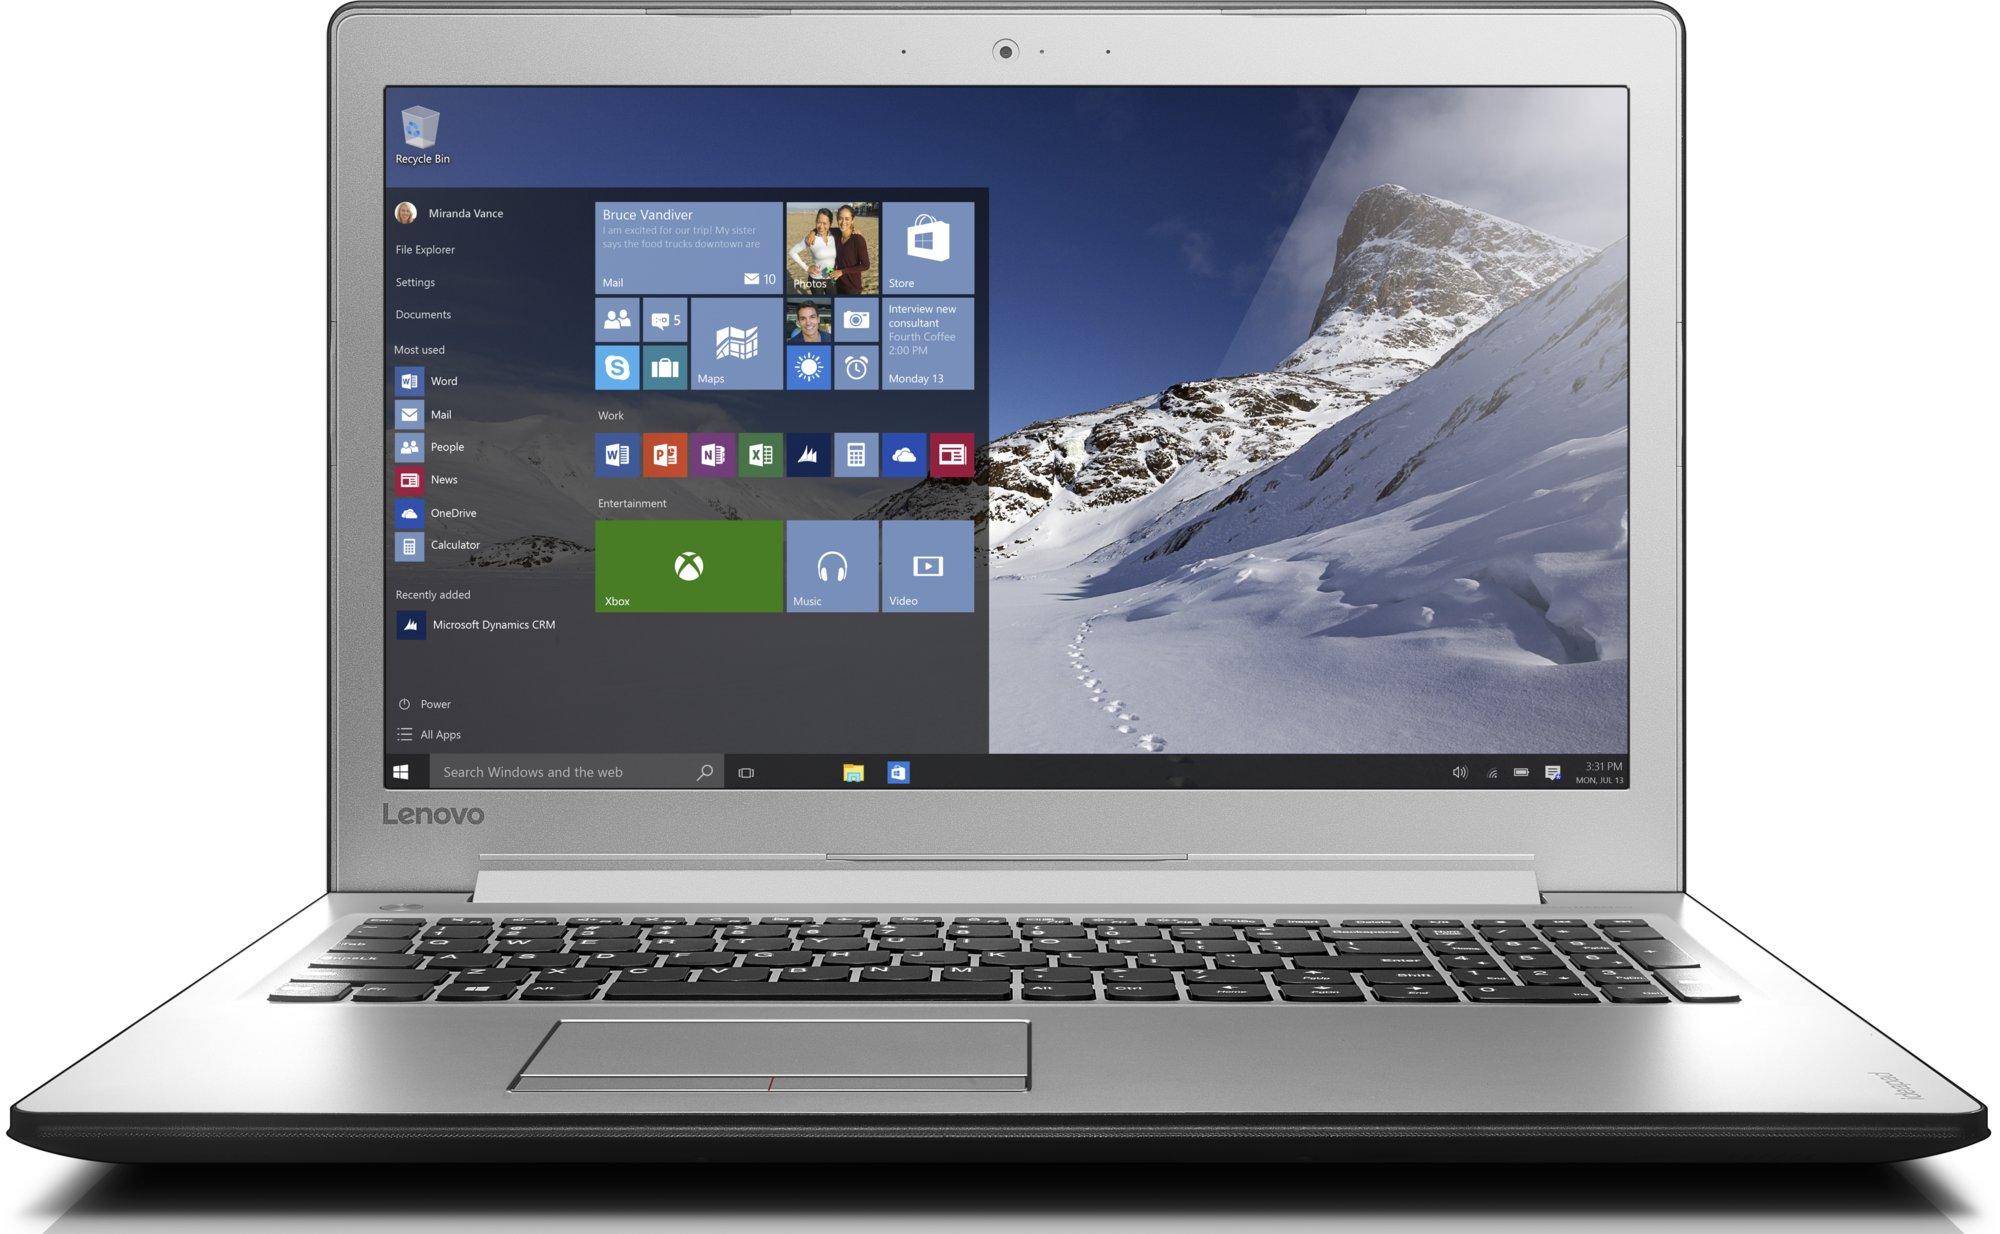 Displej notebooku Lenovo IdeaPad 510